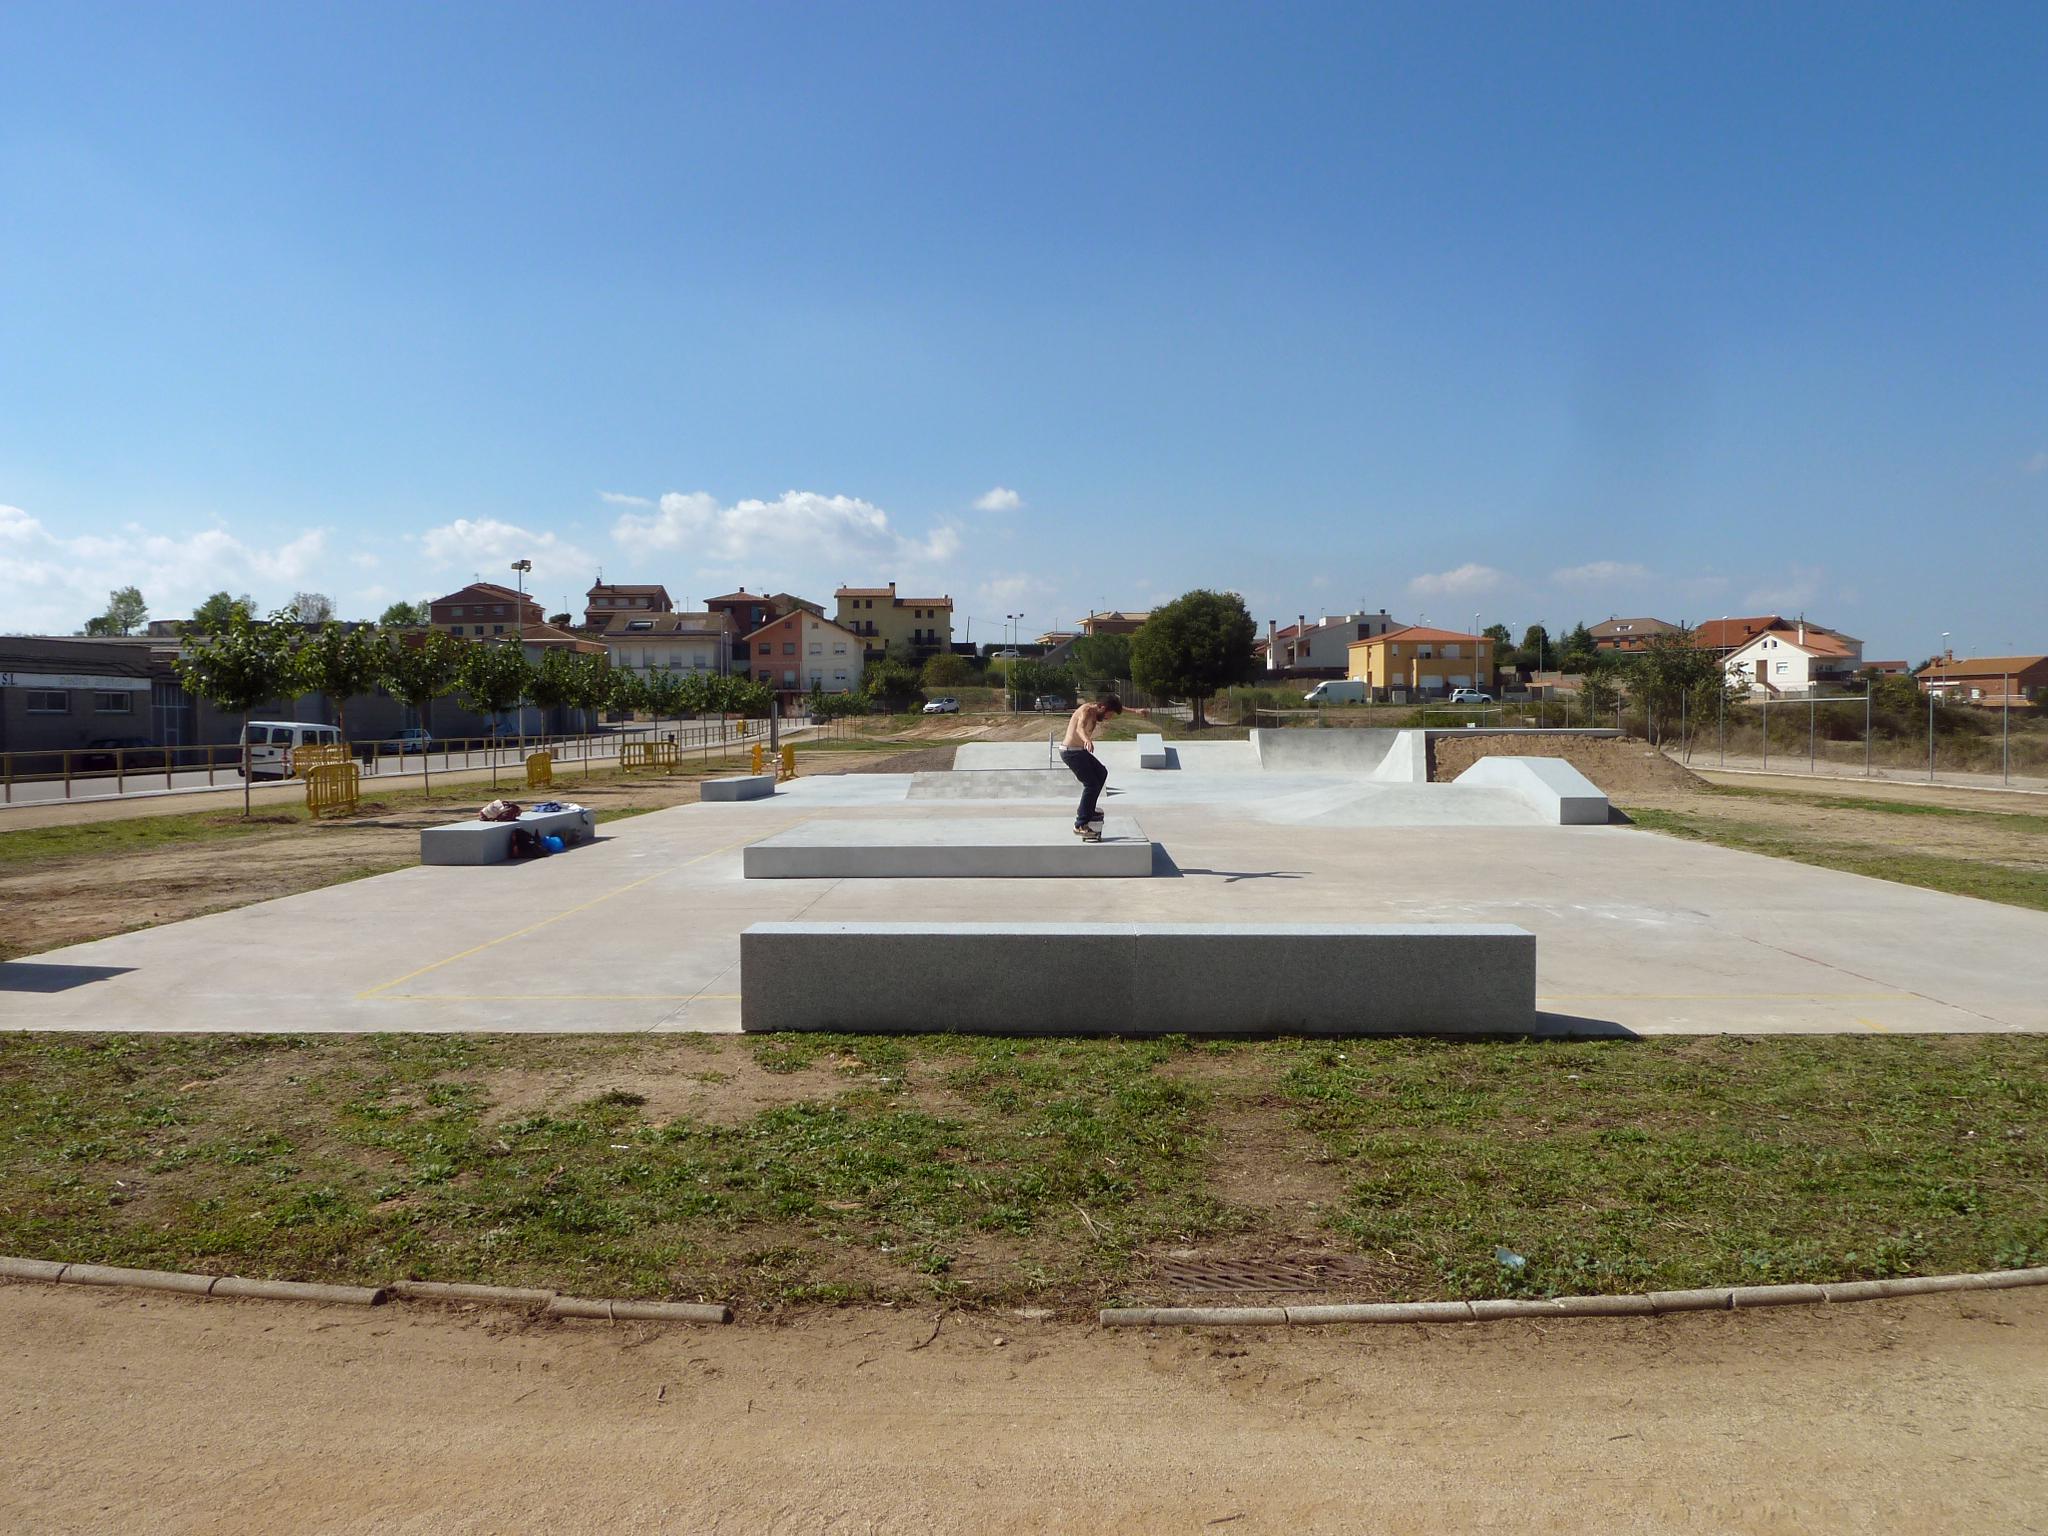 Skate-Architects-Navarcles-Skatepark-Skateplaza-01-AAP1120704.jpg